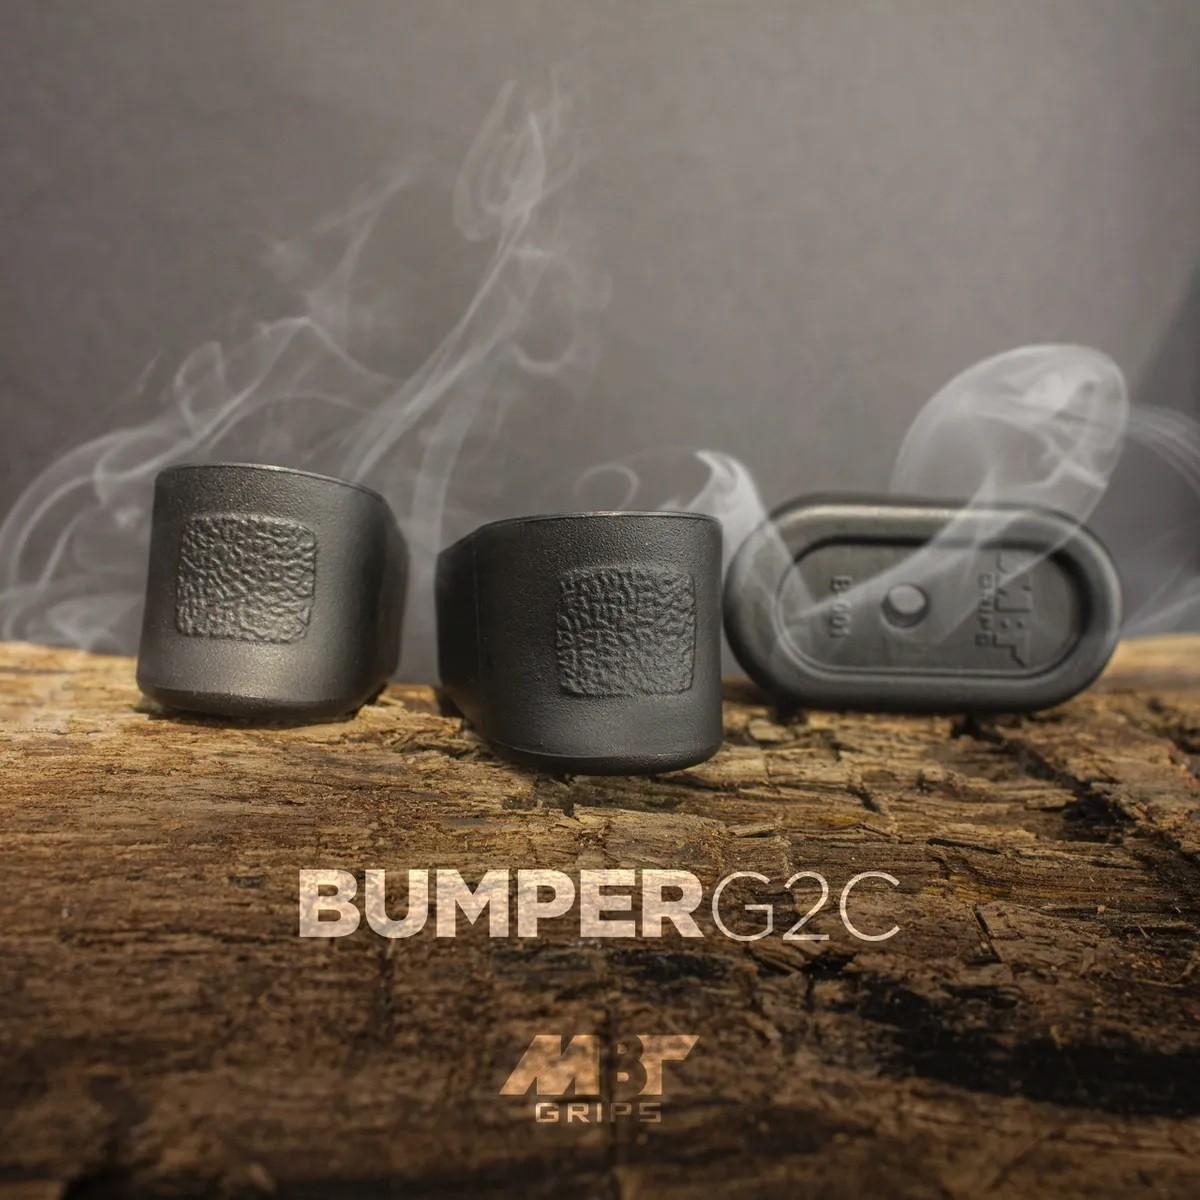 Bumper Modelo G2C